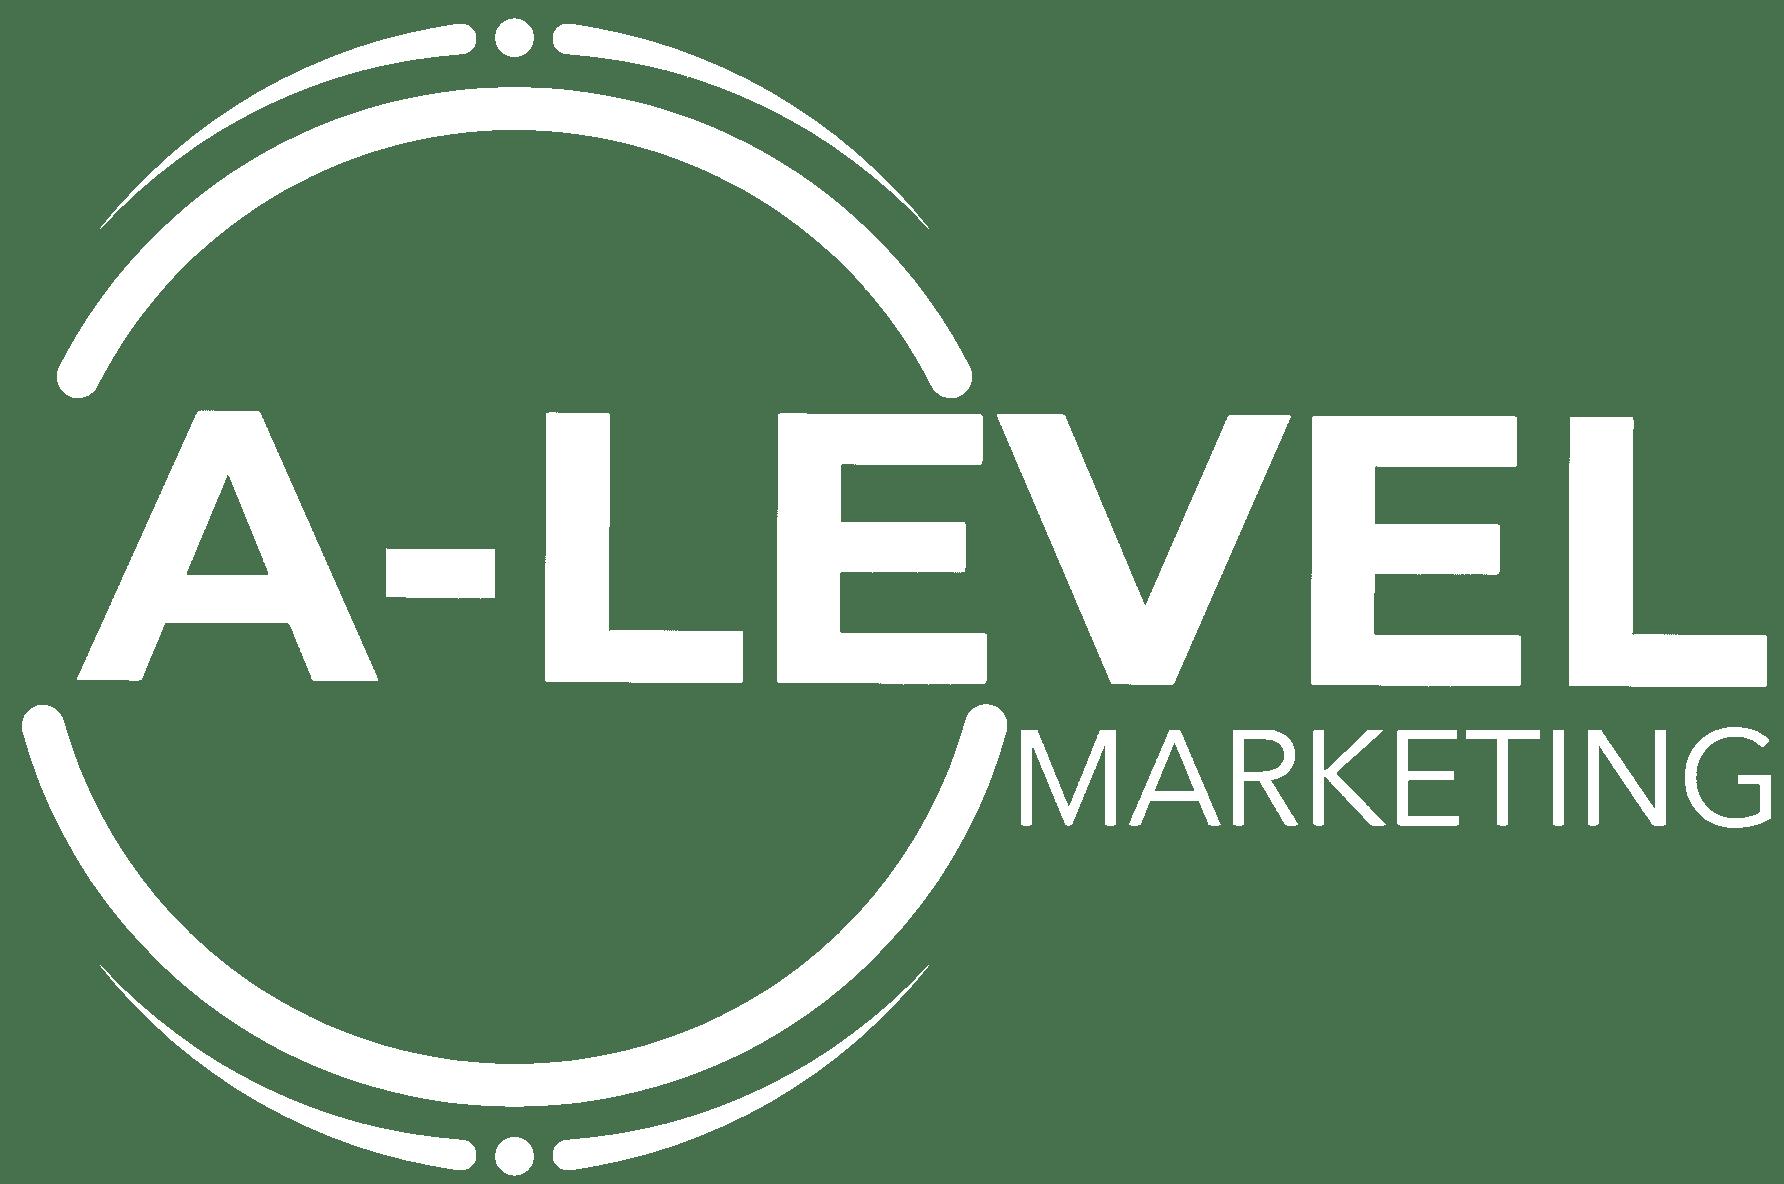 a-level marketing logo white